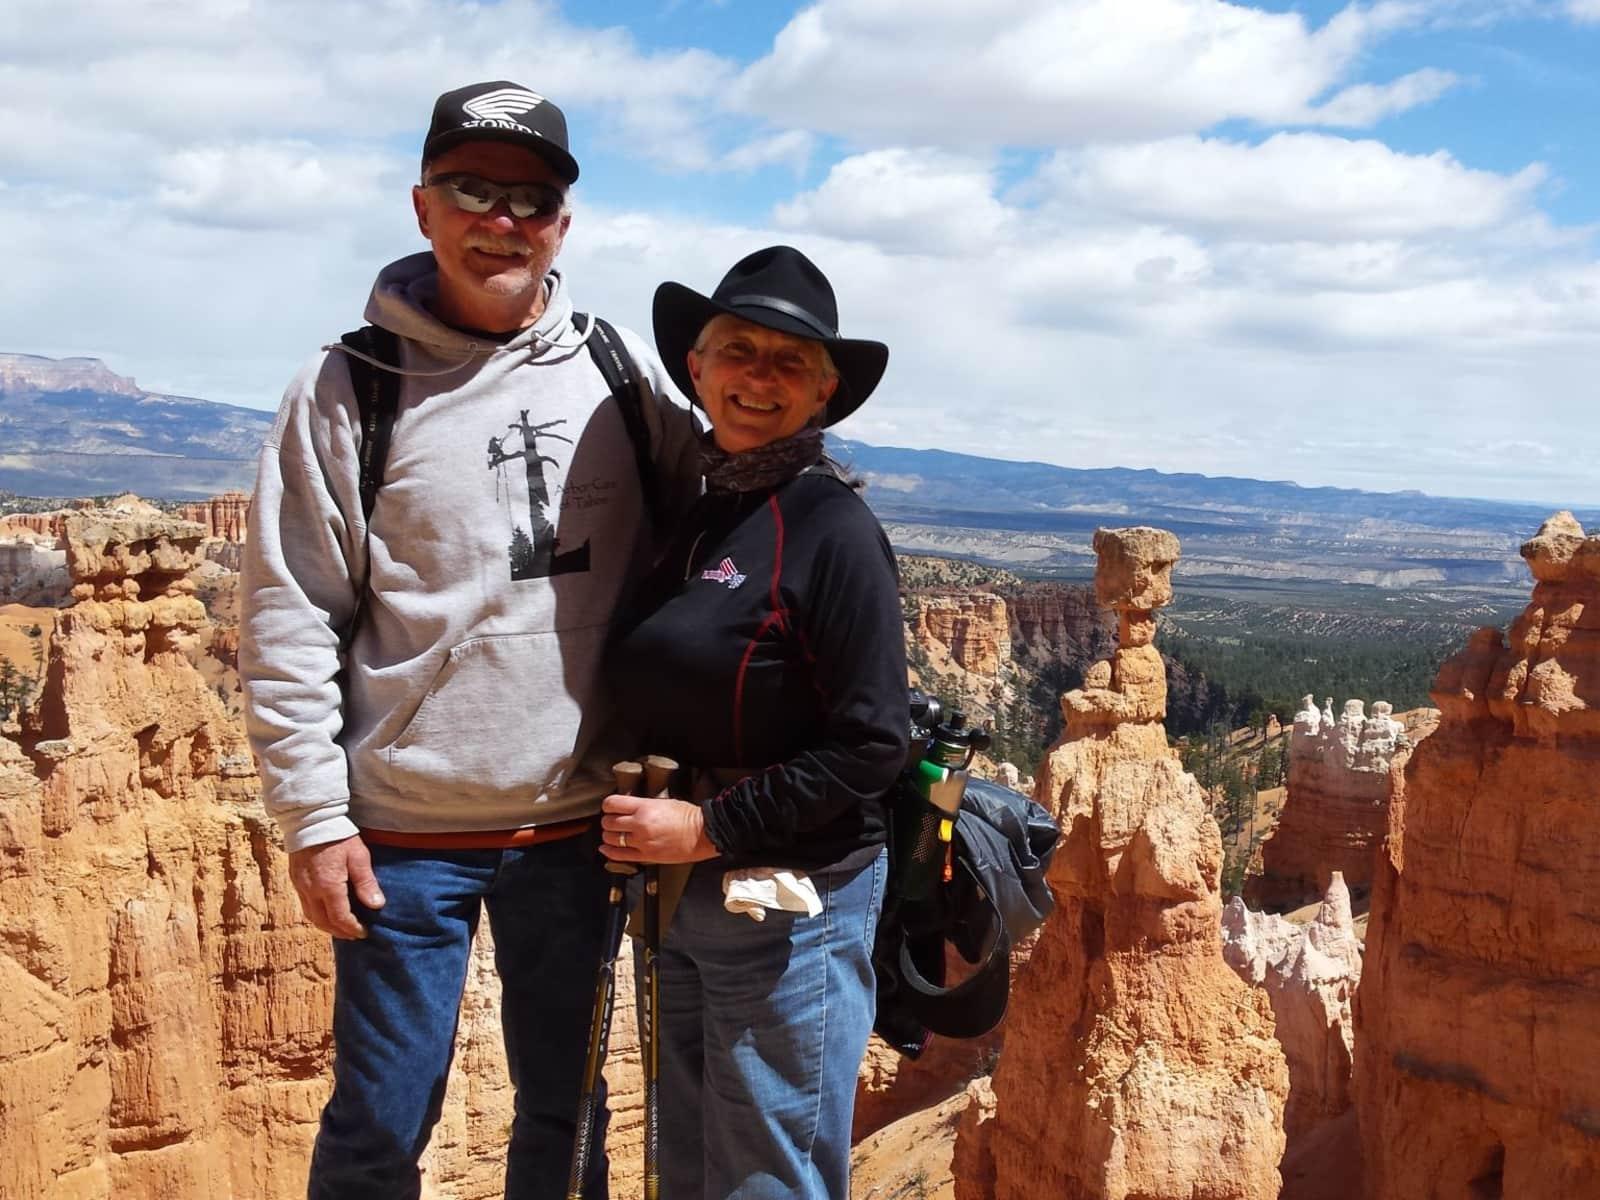 Marlene & John from San Luis Obispo, California, United States